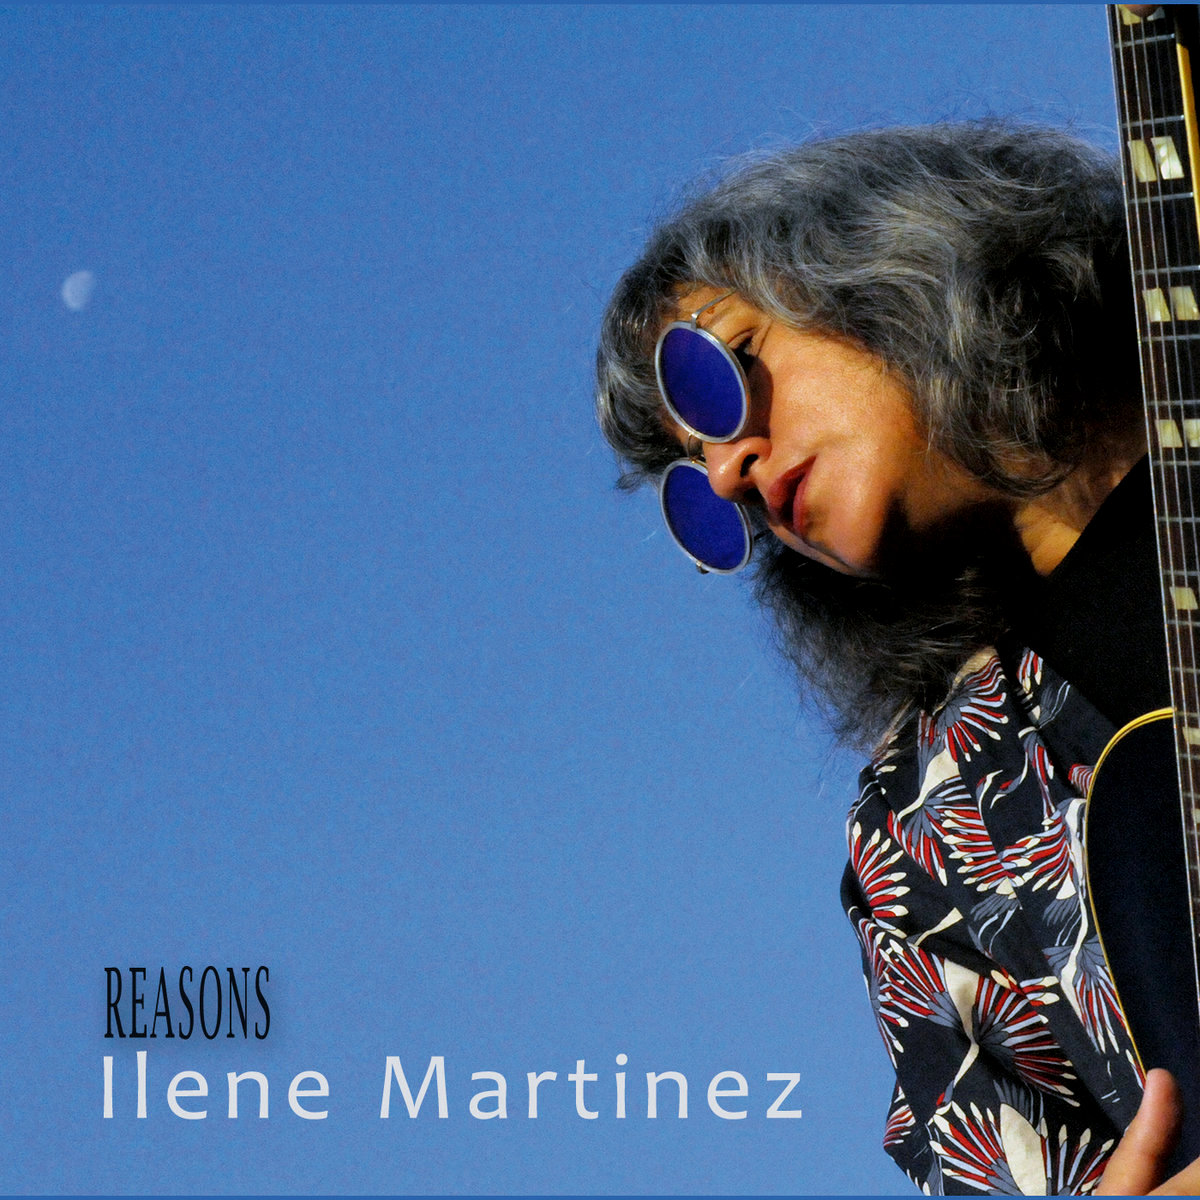 Ilene Martinez